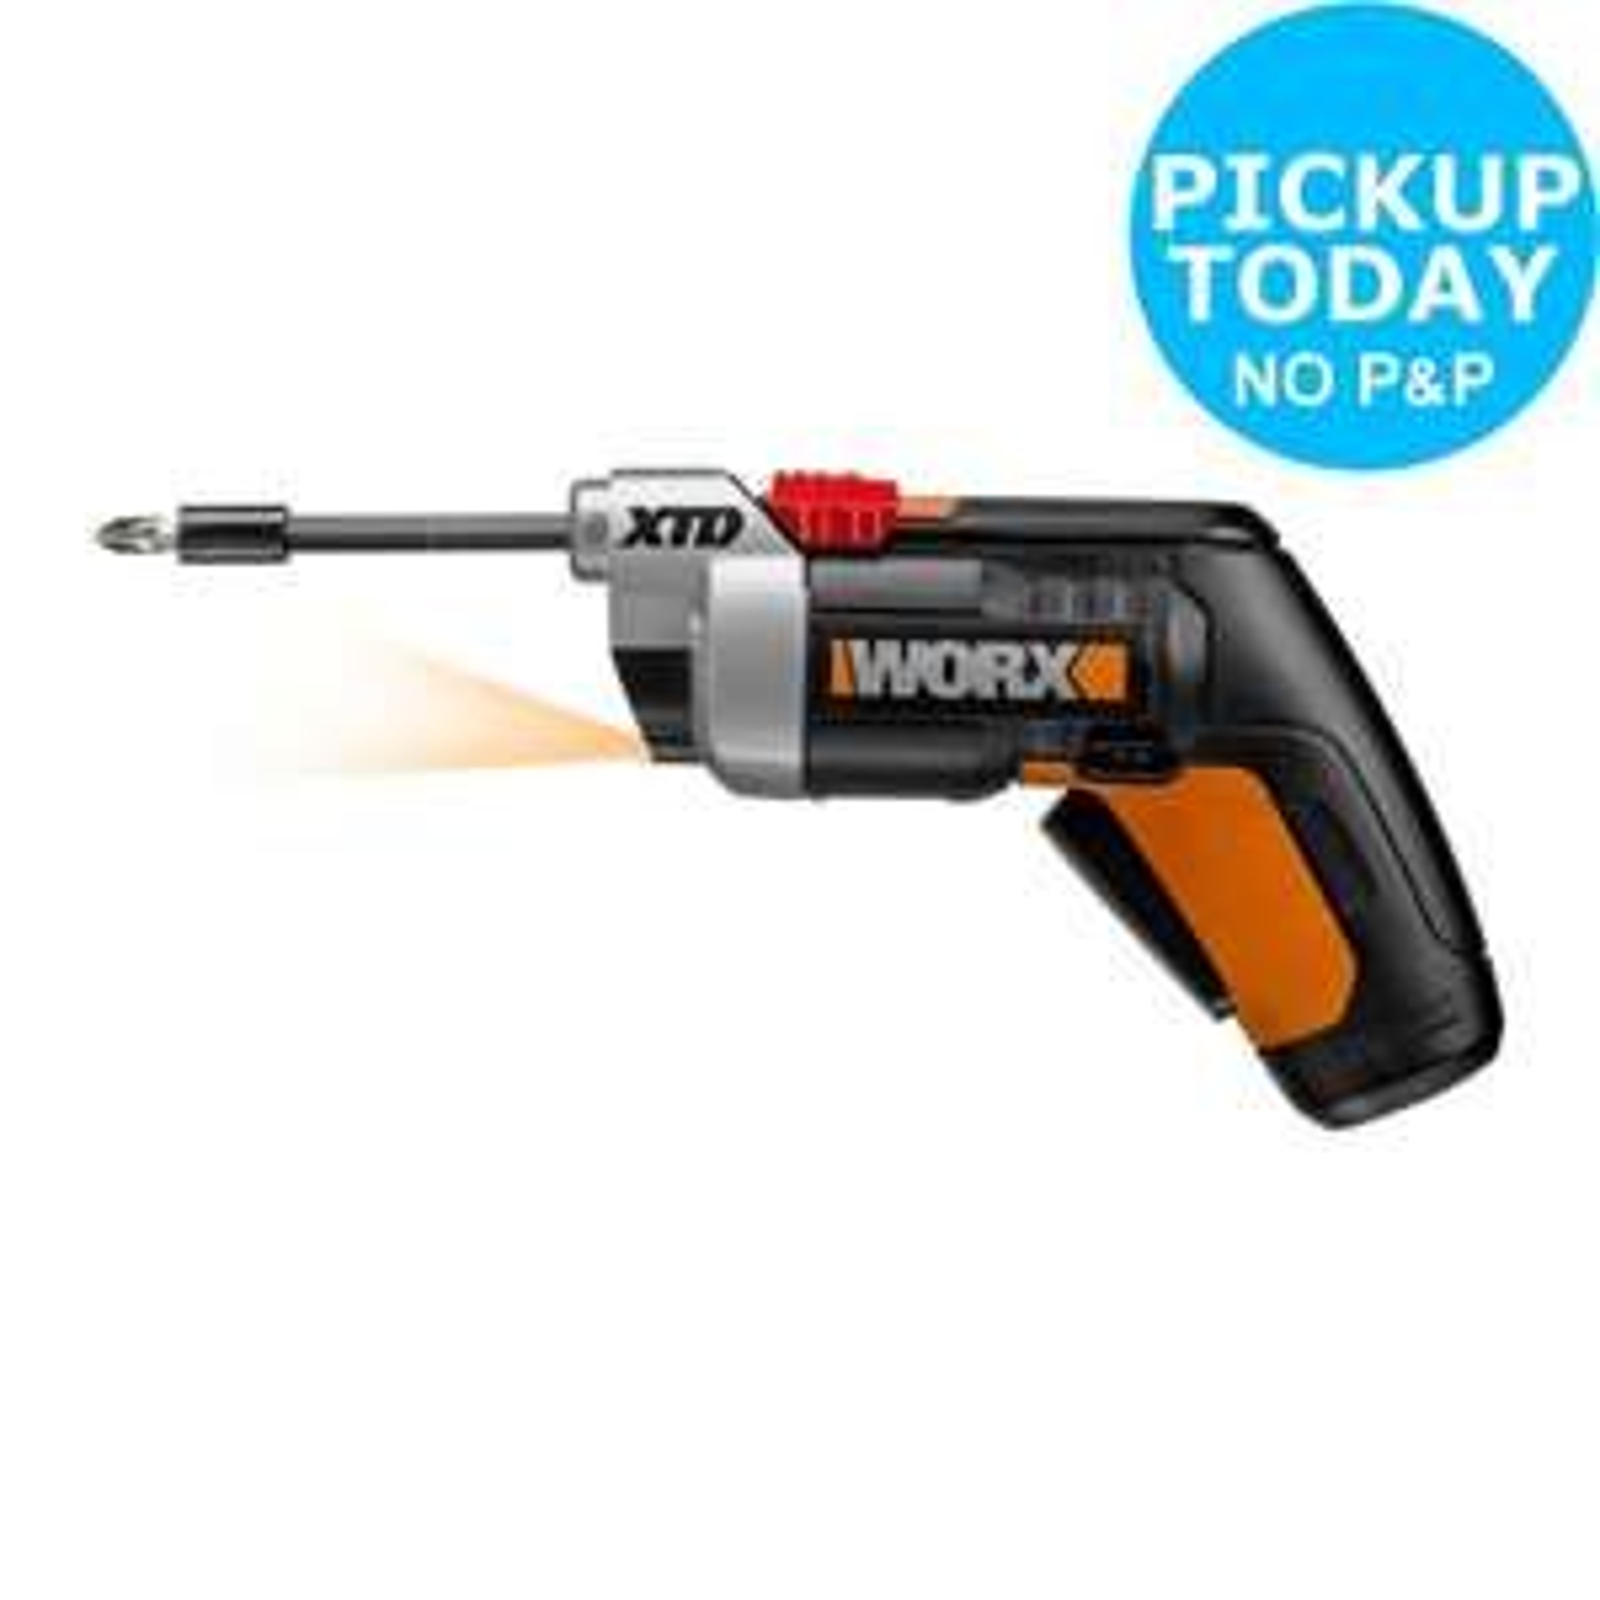 Worx WX252 Extending Cordless Screwdriver - 4V - £15 delivered at Argos/ebay